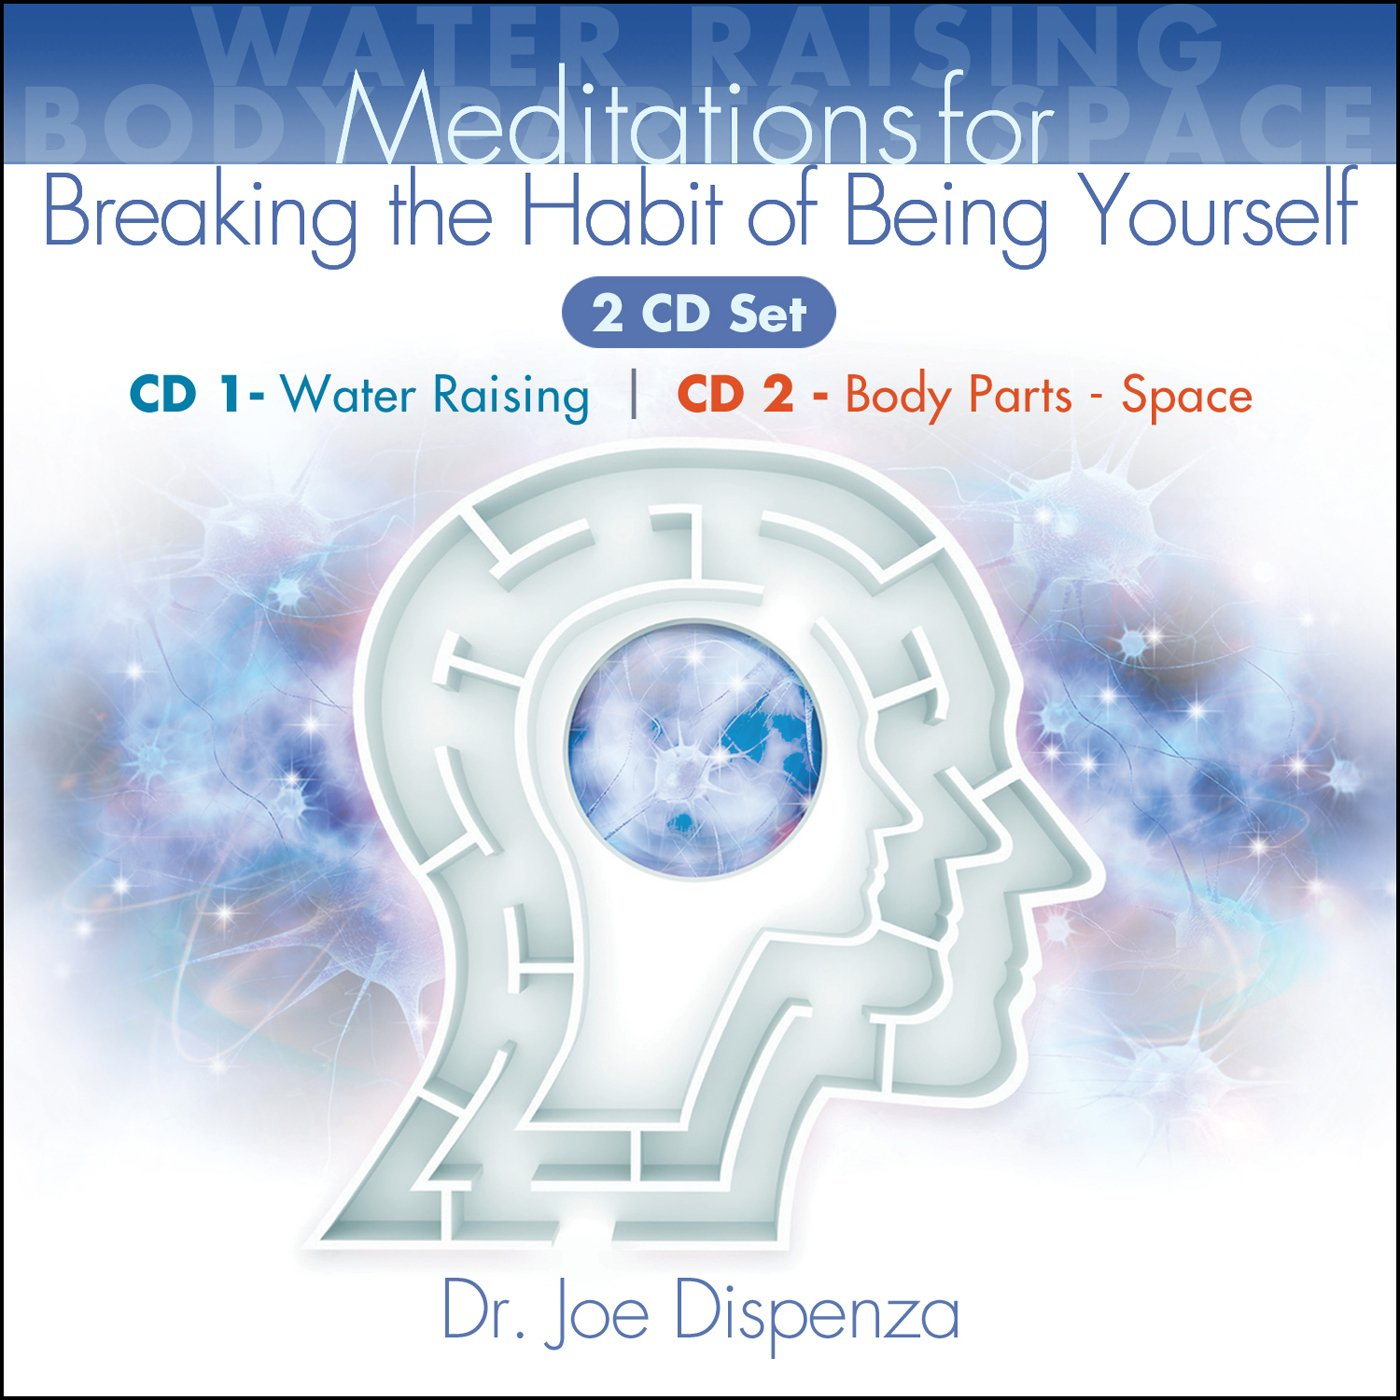 Joe dispenza meditation